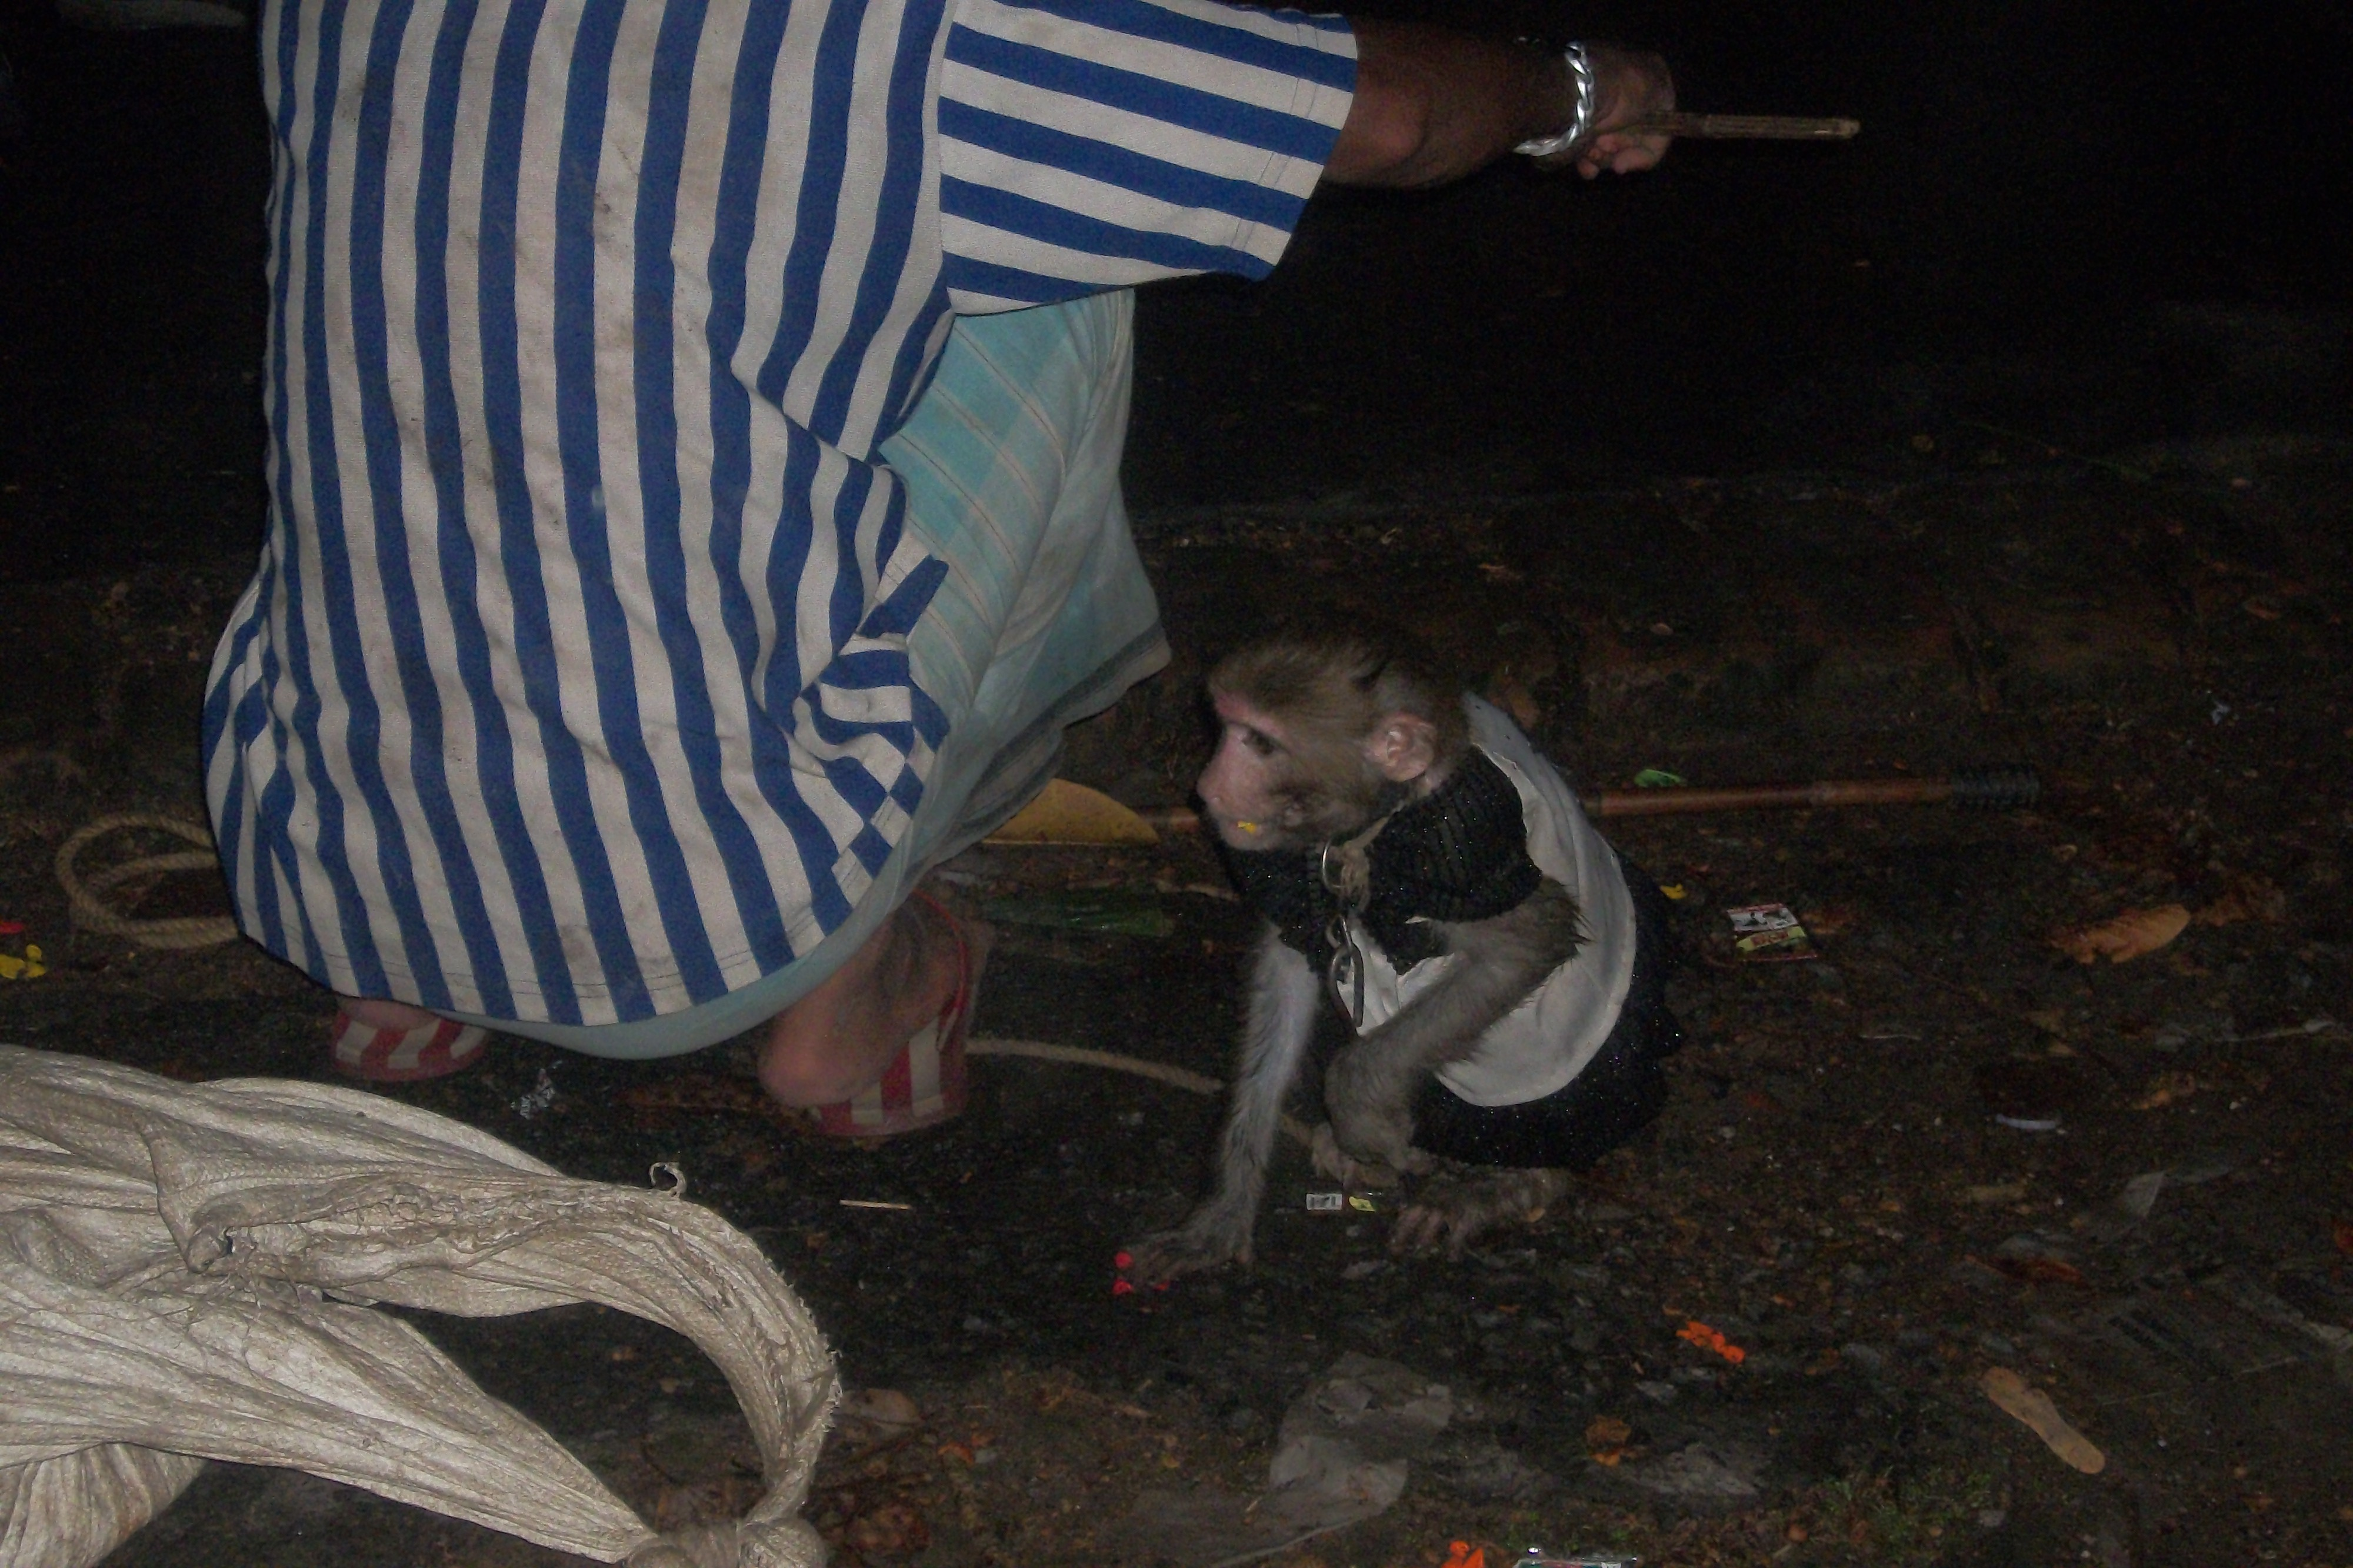 Rancho-Monkey acts are performed near the Victoria memorial-Kolkata